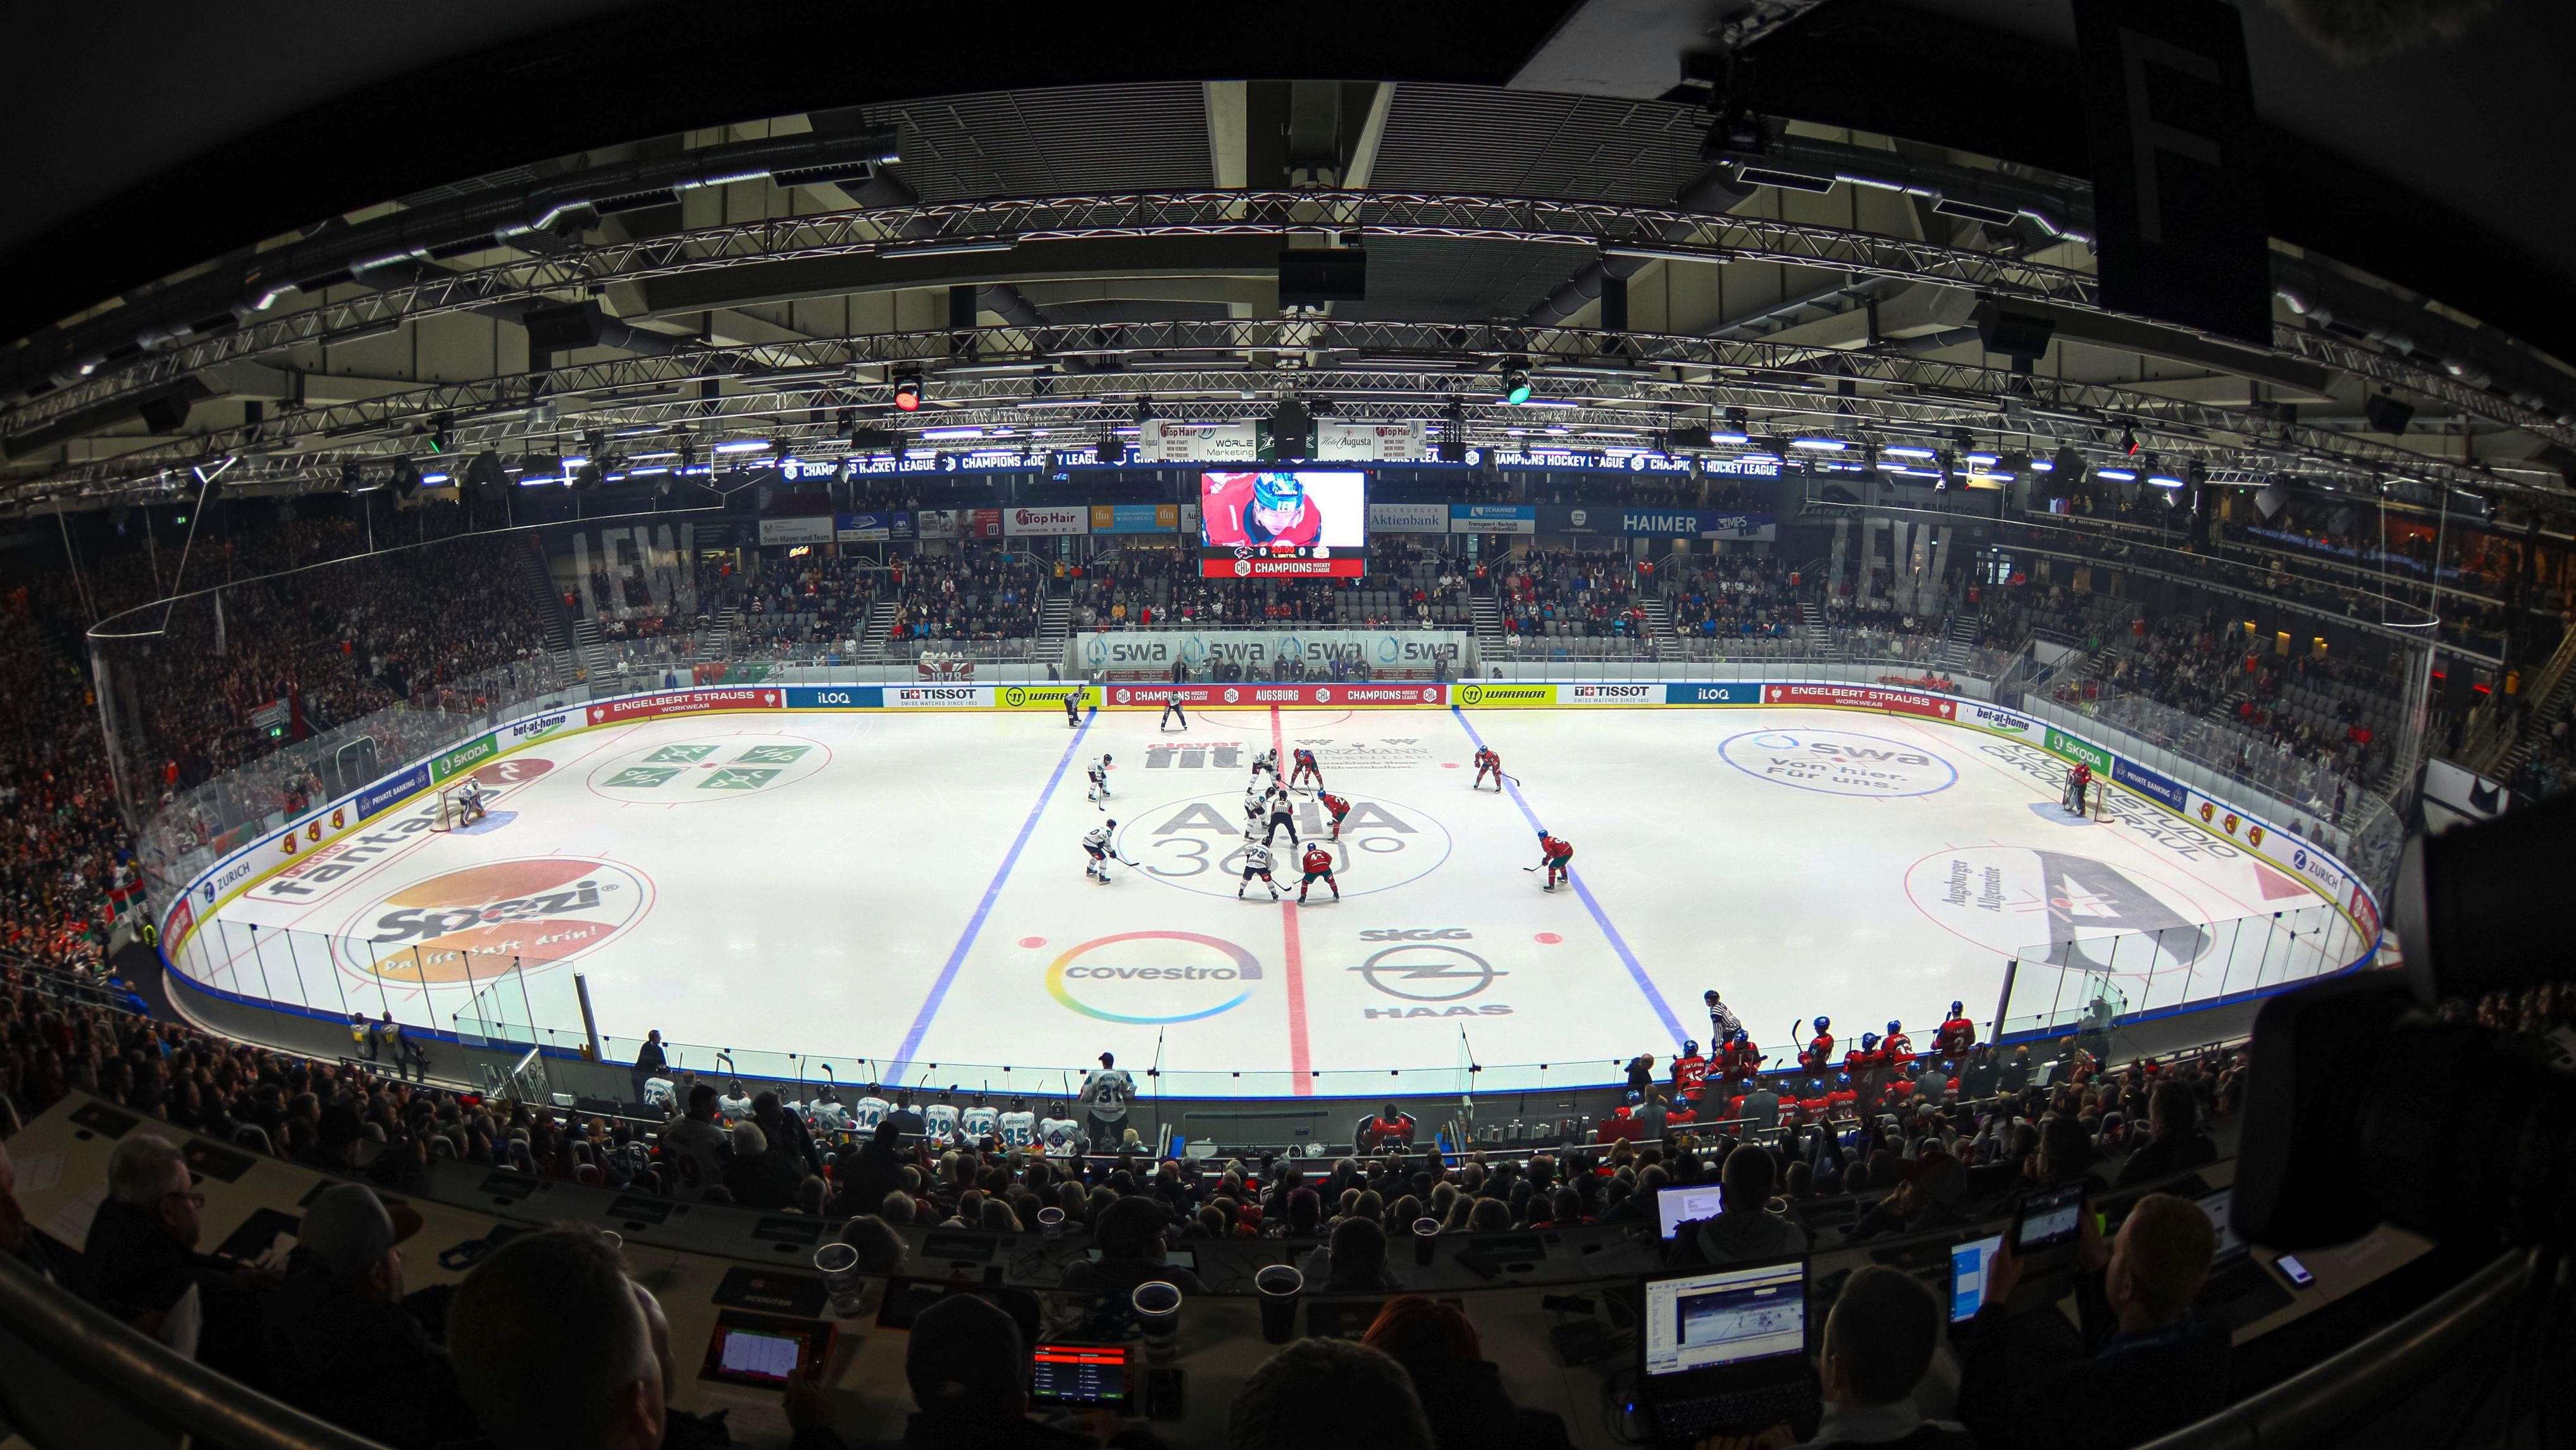 Stadion der Augsburger Panther